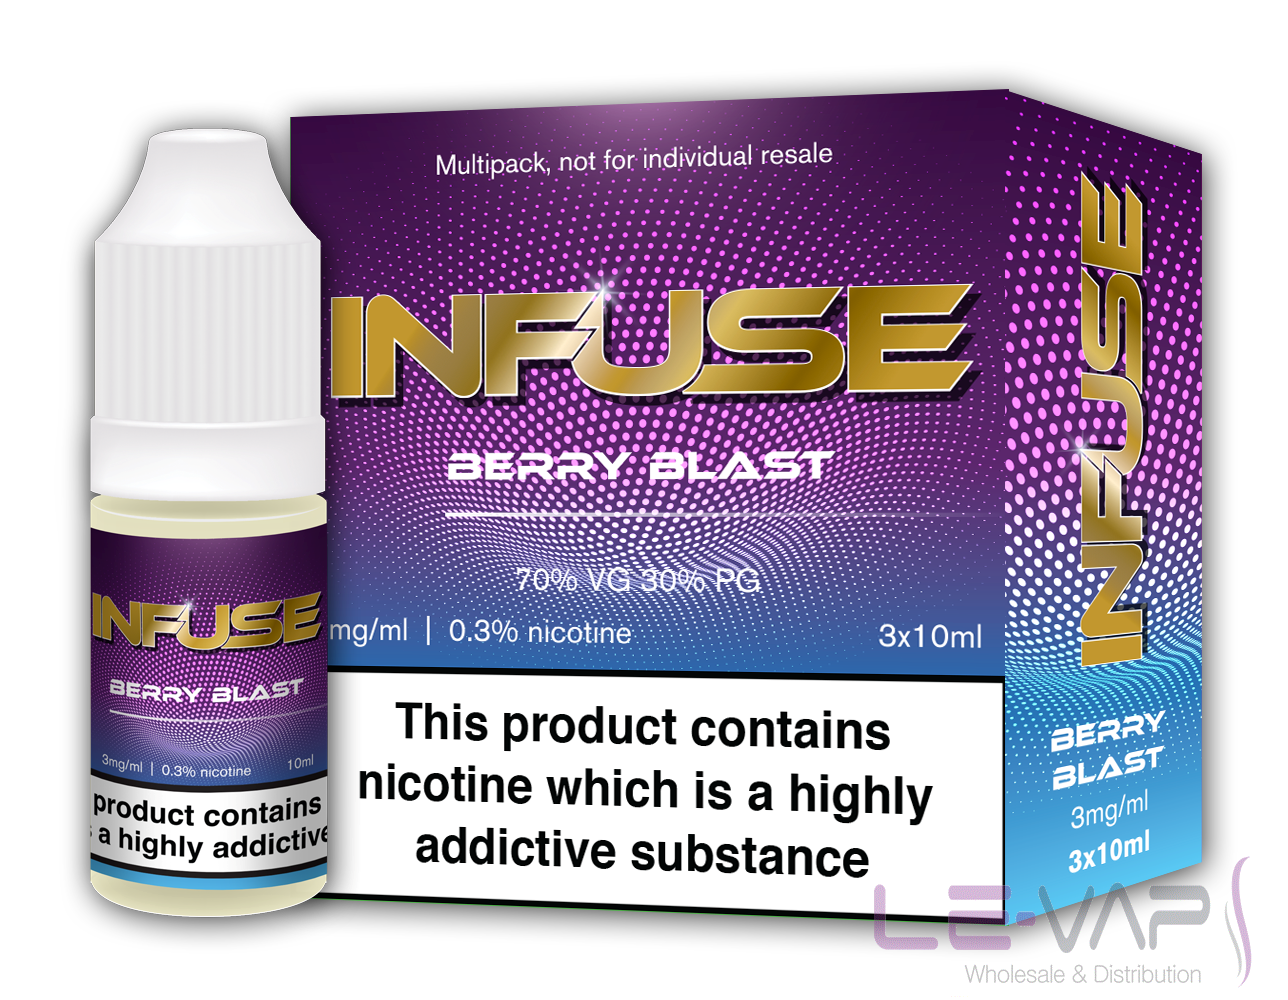 Berry Blast E LIQUID  BY VAPE INFUSE